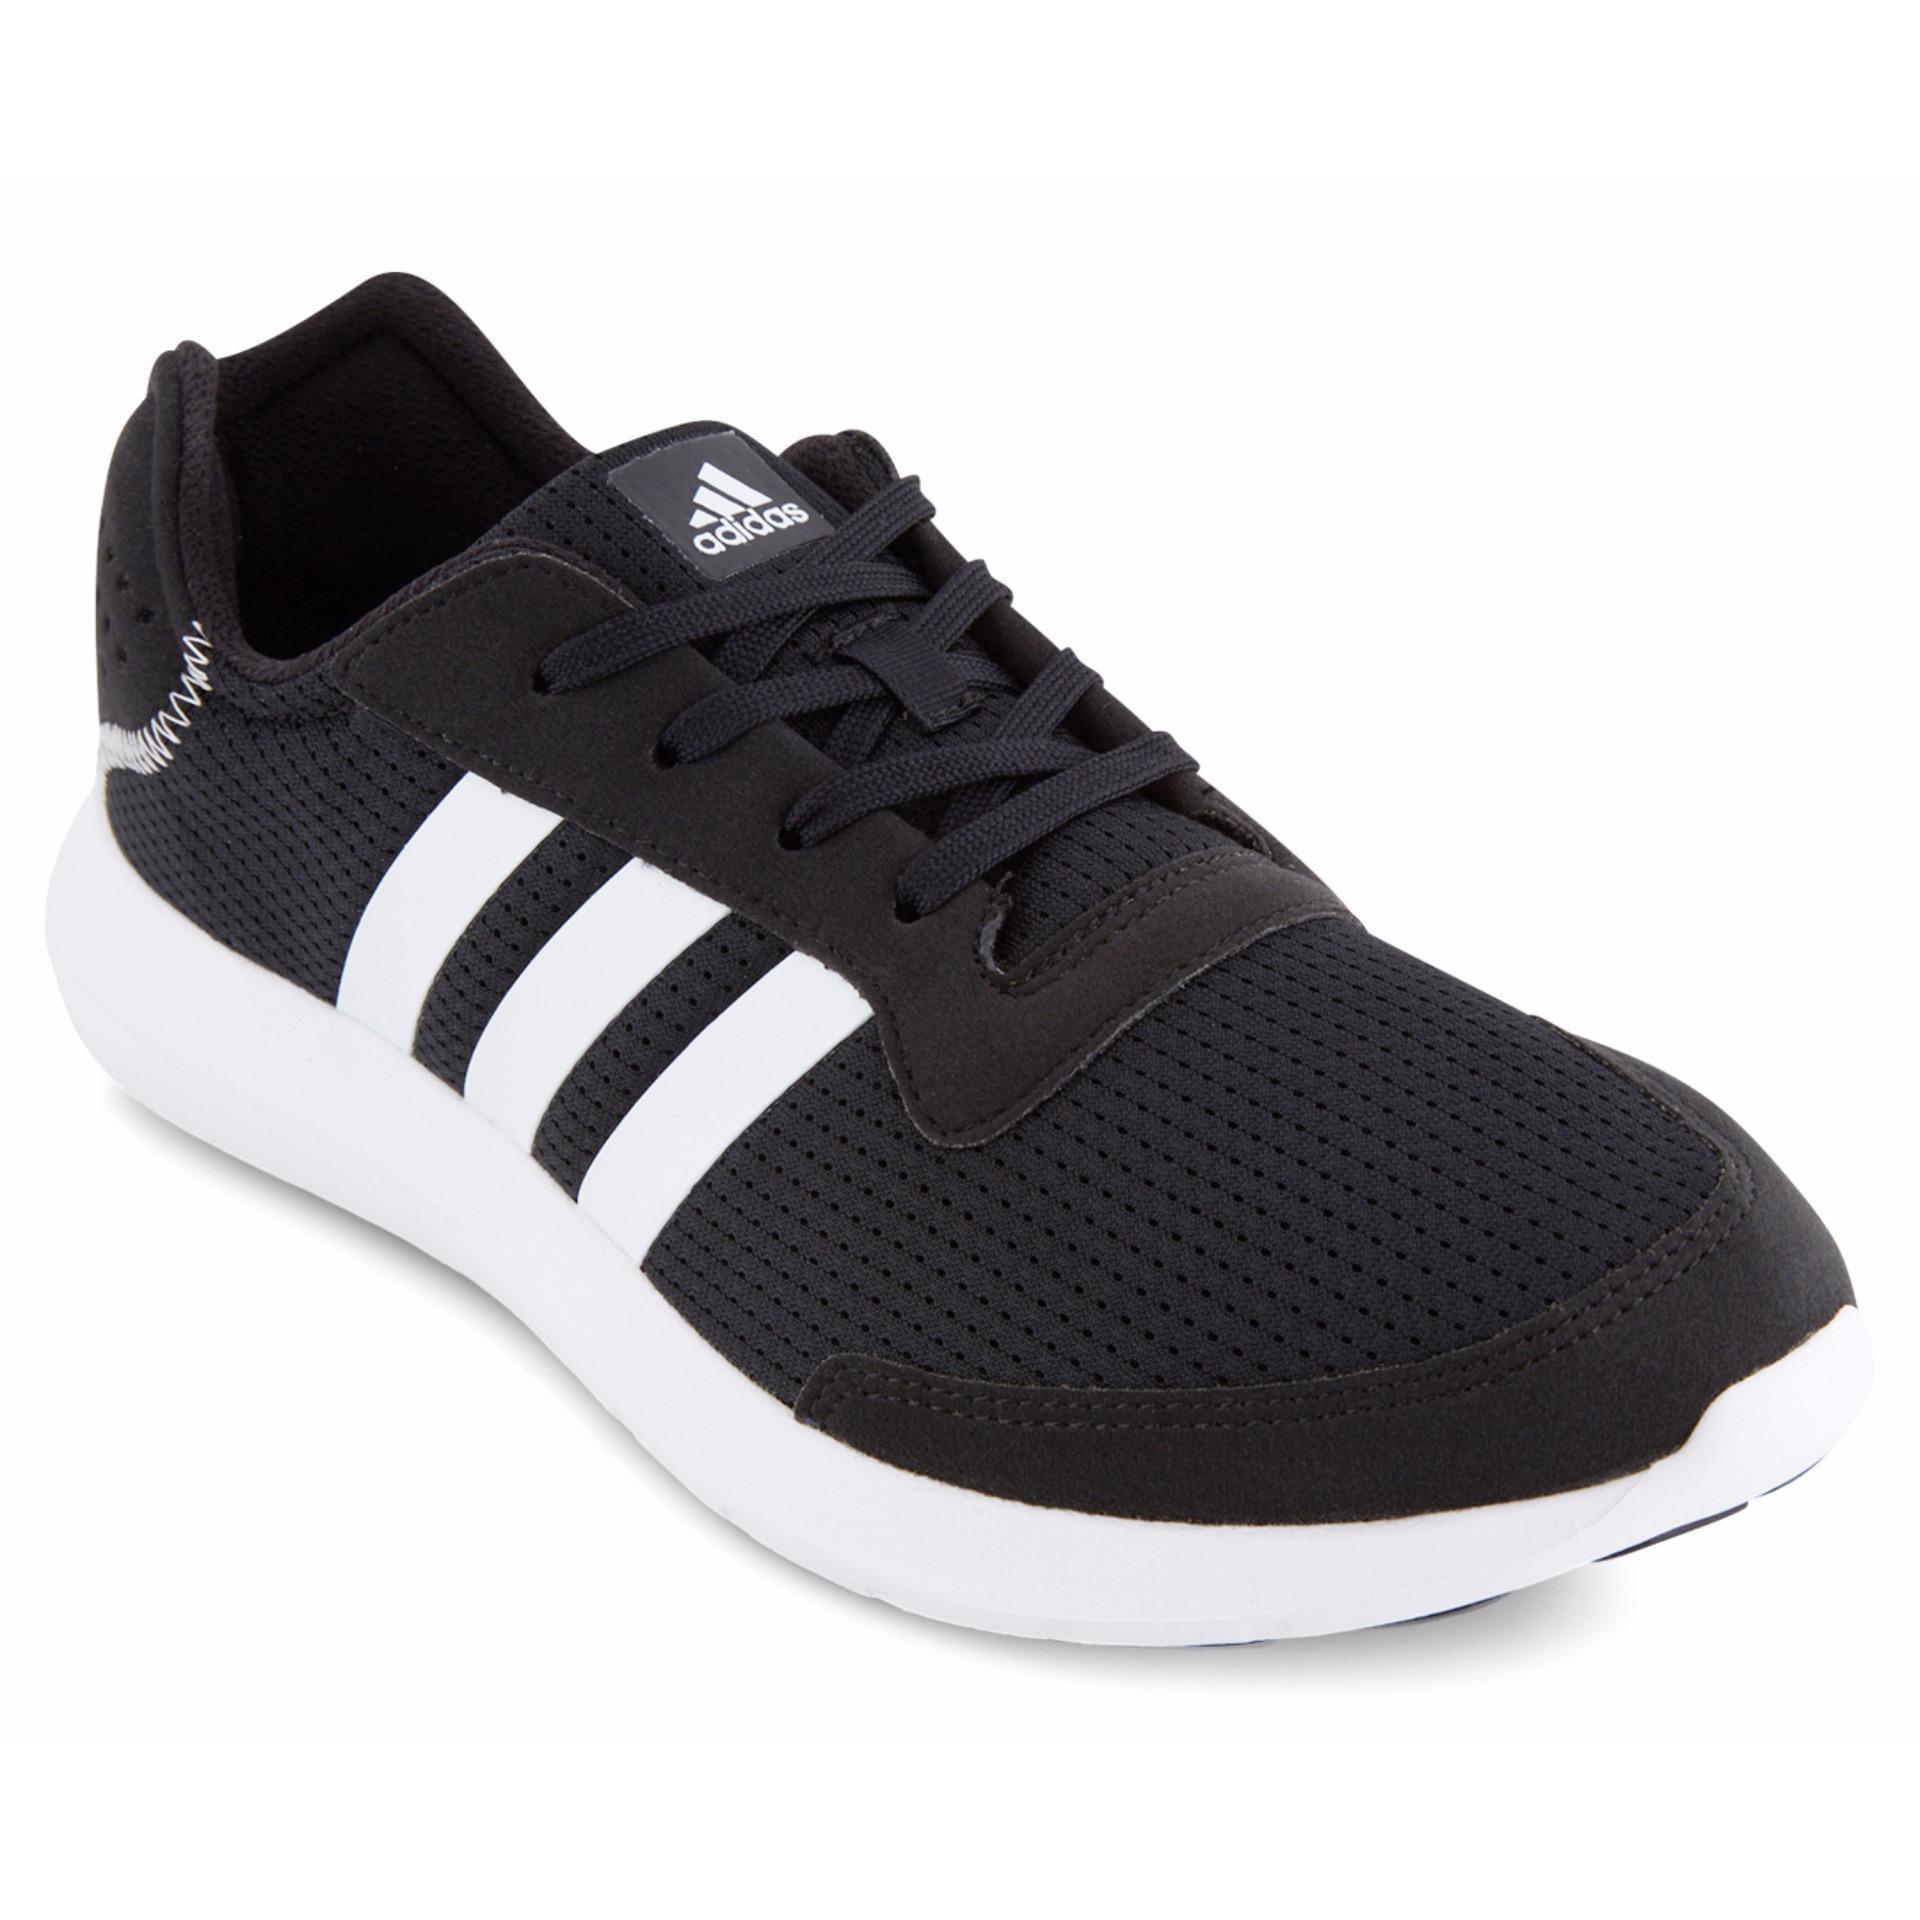 Adidas Sepatu Running Element Refresh Ba7911 Hitam Terbaru